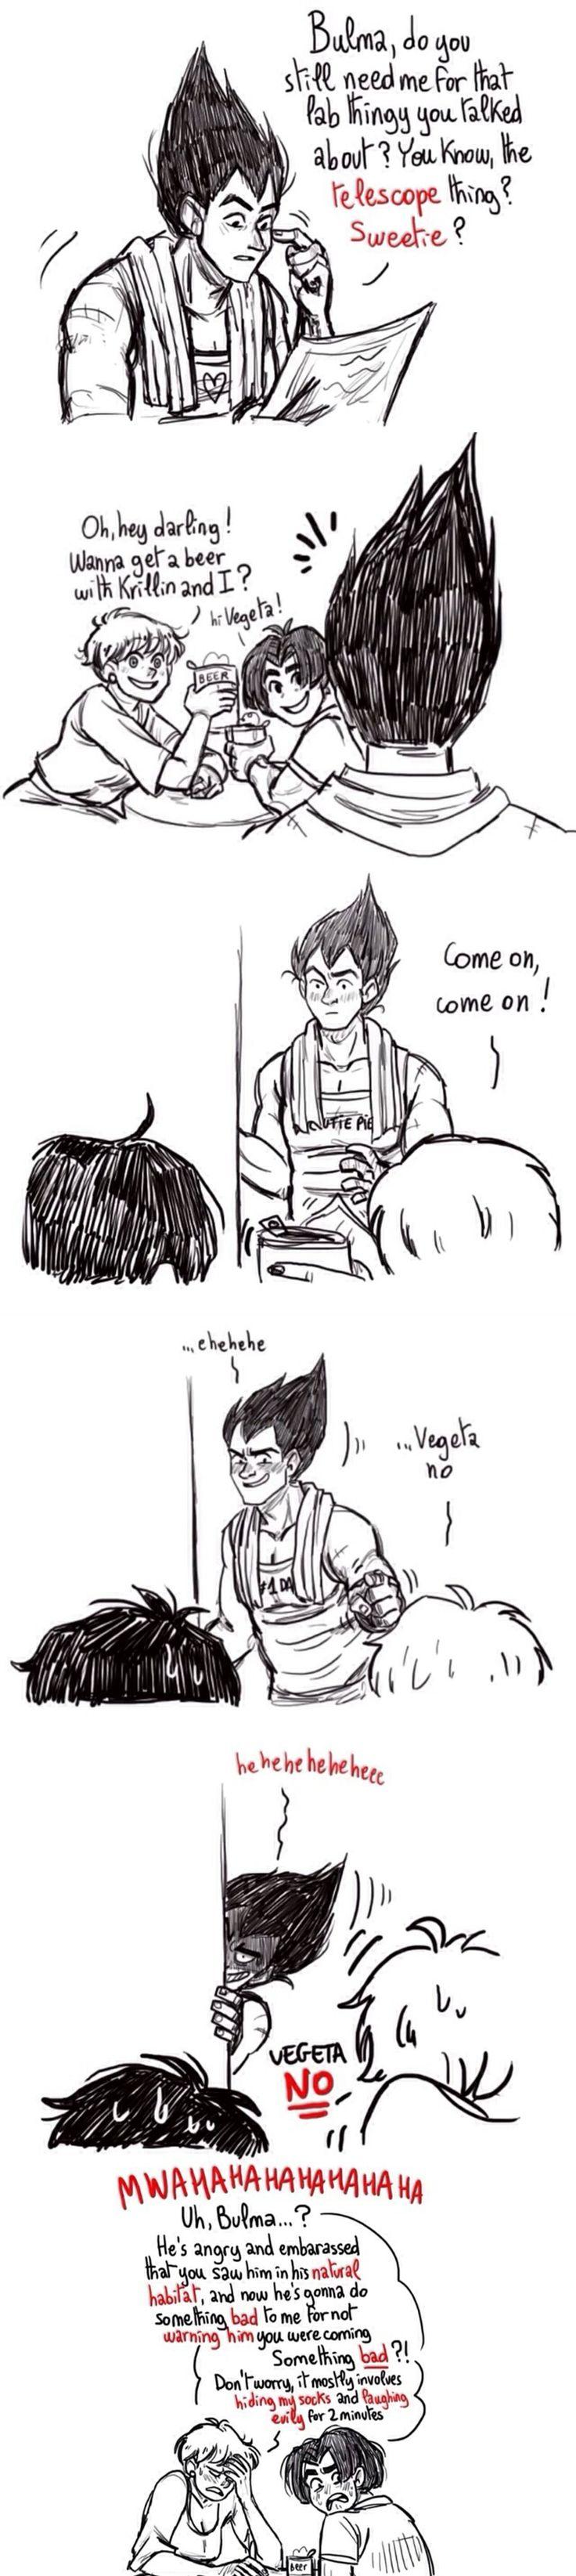 Vegeta and Bulma funny